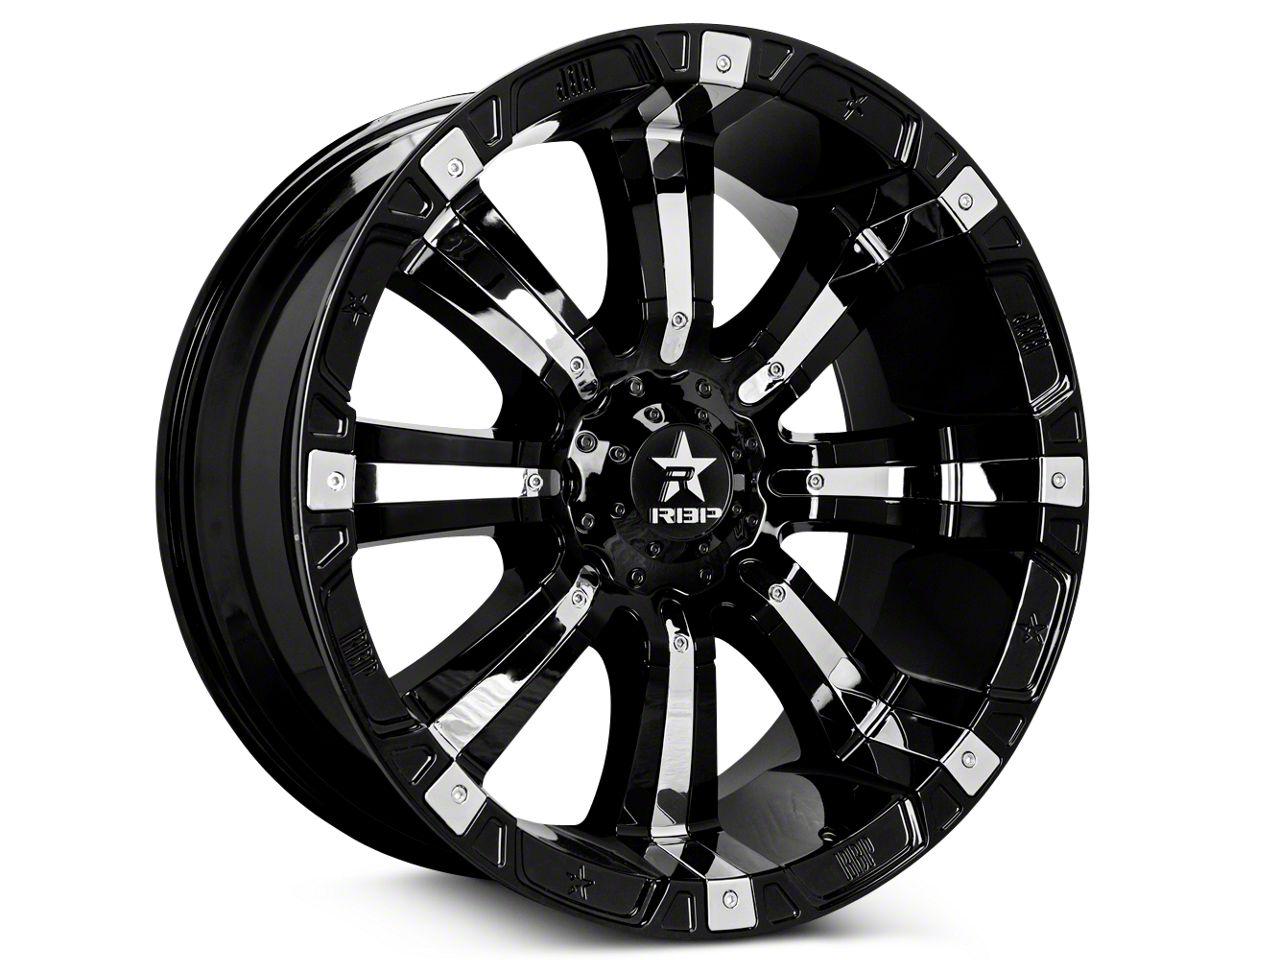 RBP 94R Black w/ Chrome Inserts 5-Lug Wheel - 20x9 (02-18 RAM 1500, Excluding Mega Cab)